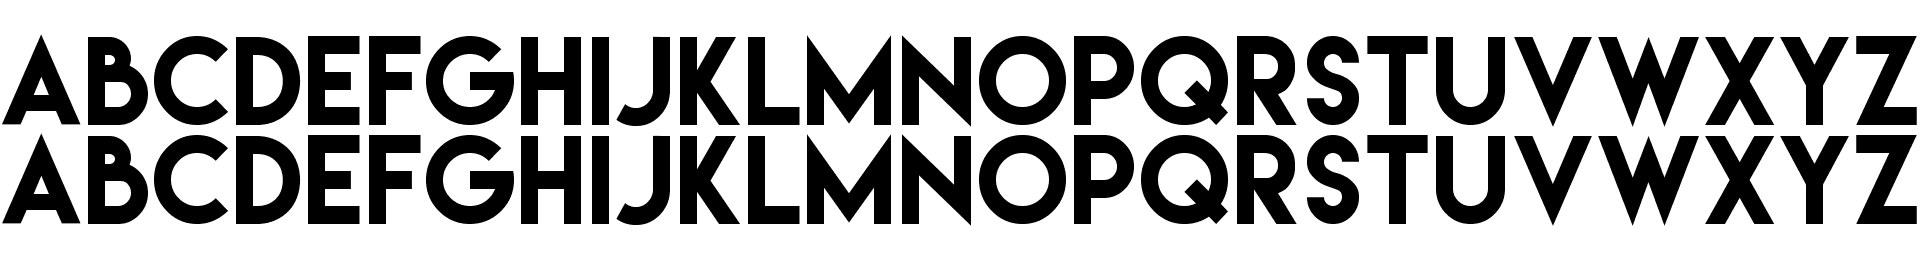 Lemon/Milk